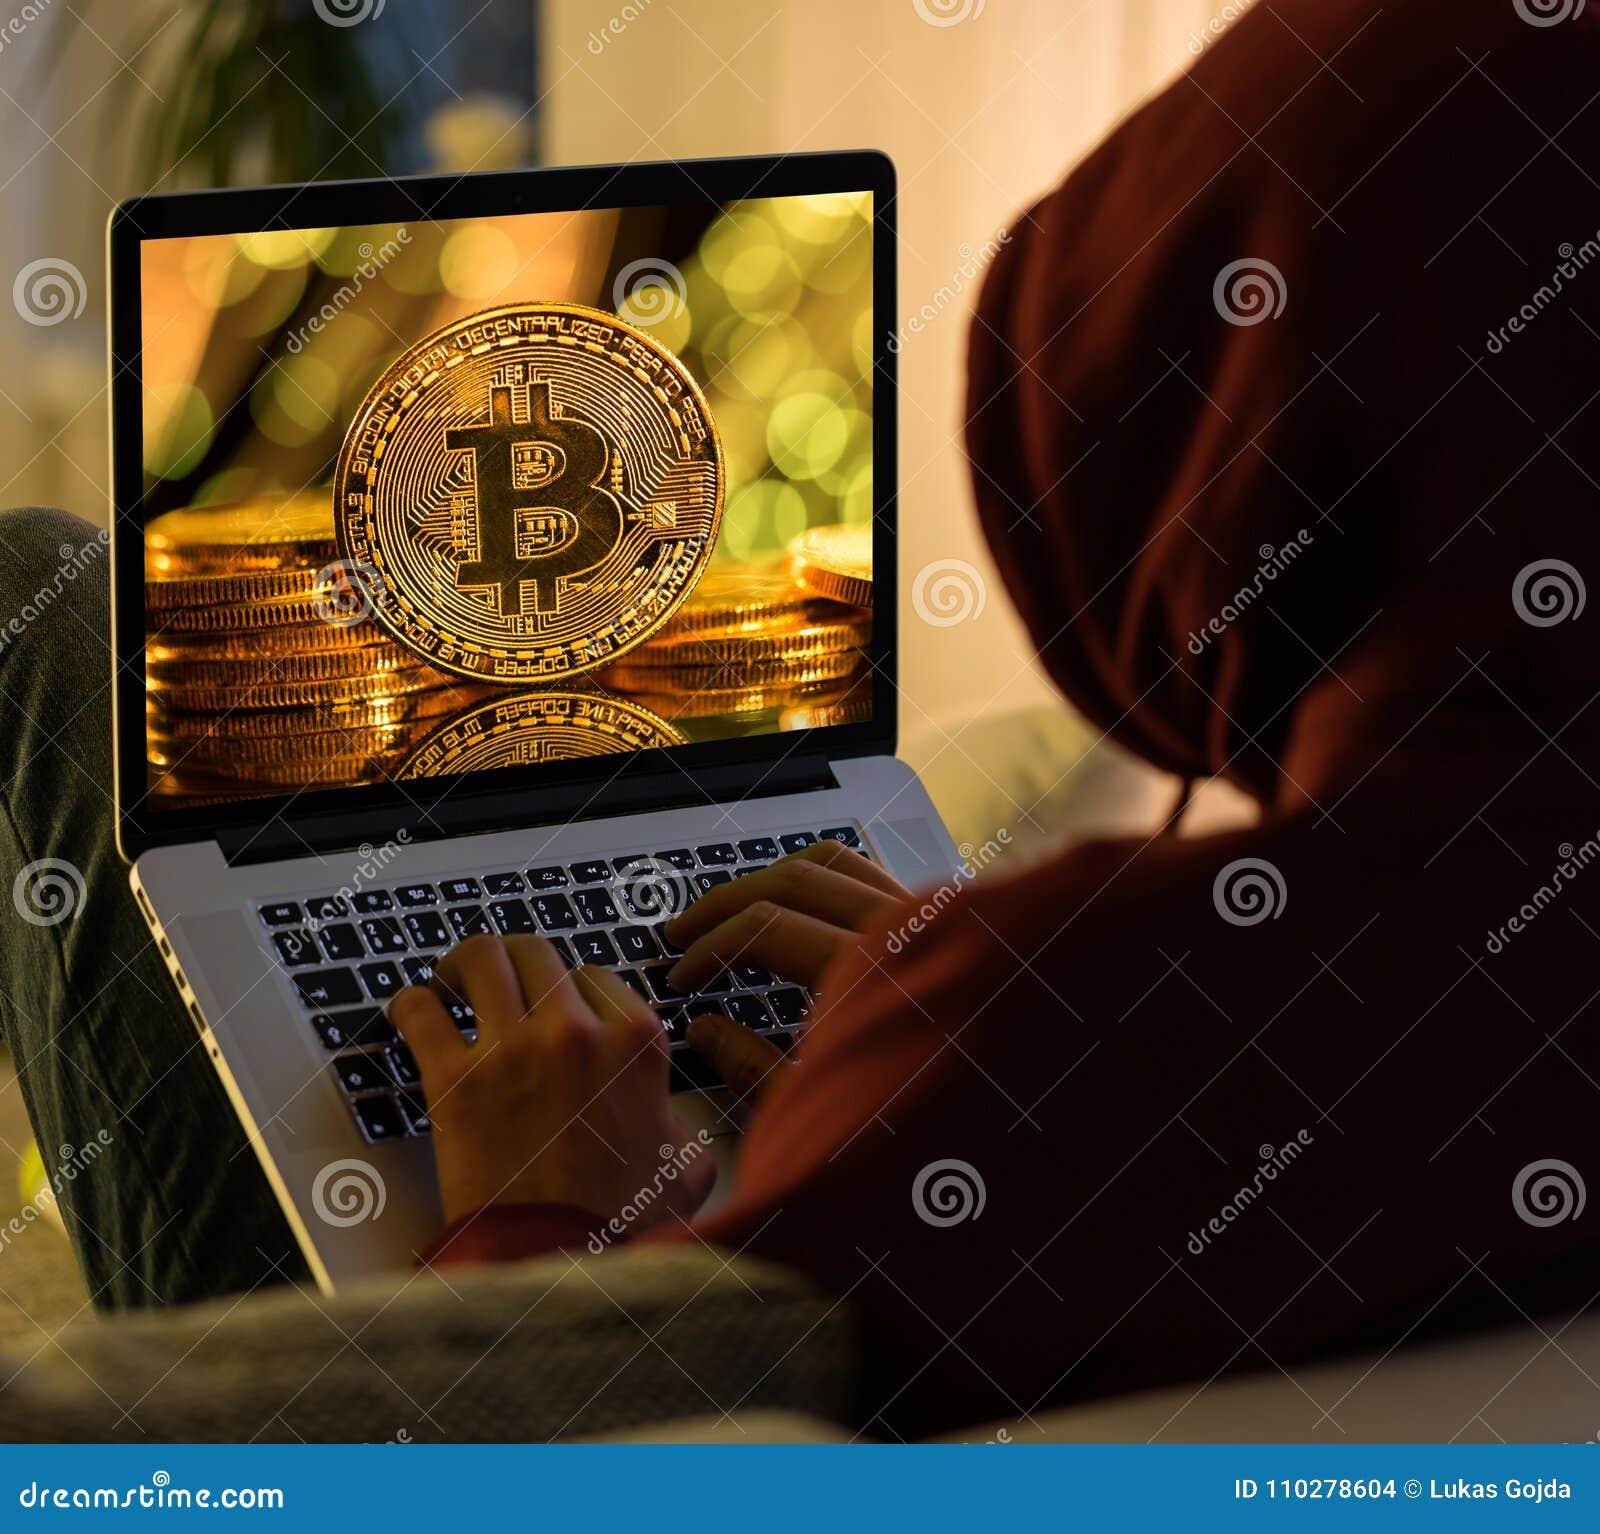 Bitcoin złocista moneta i anonimowy hackera sittign z laptopem